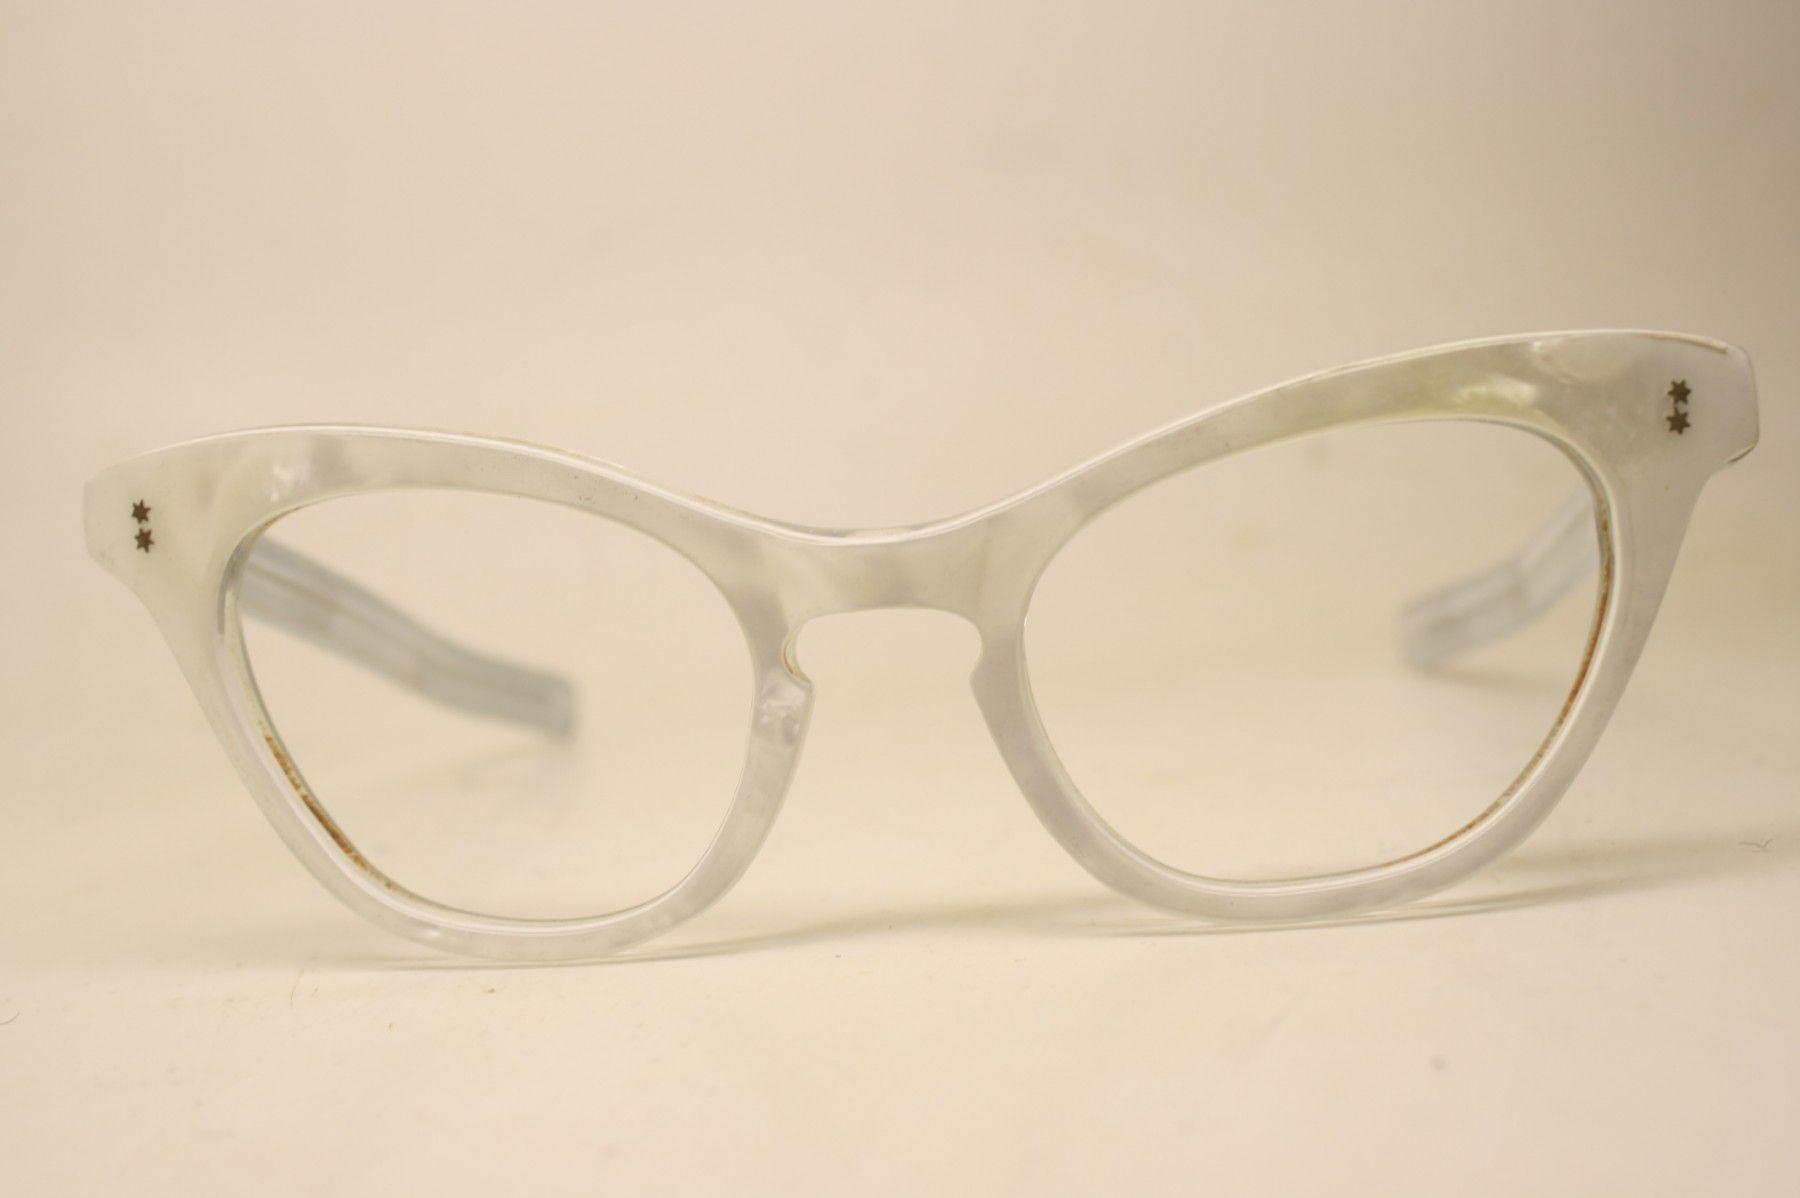 05c964e98b Unused White Vintage Cat Eye Glasses New Old Stock - Cat eye glasses -  Vintage eyeglasses